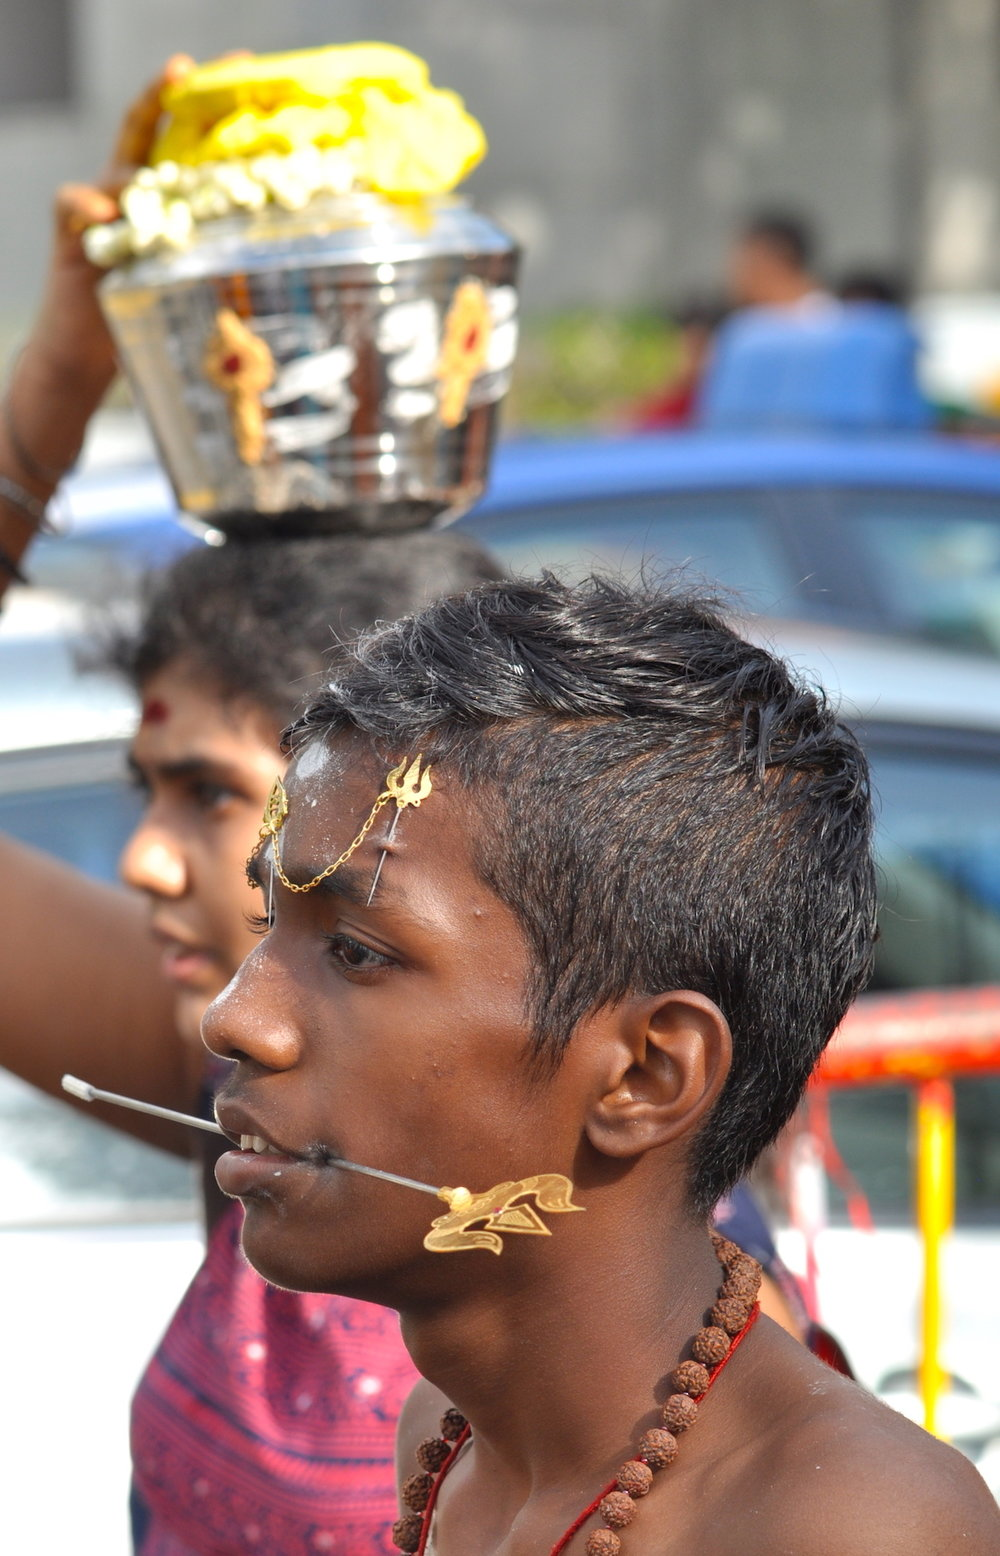 Young man at Serangoon Street during Thaipusam (Singapore). Photo: David Mattatia